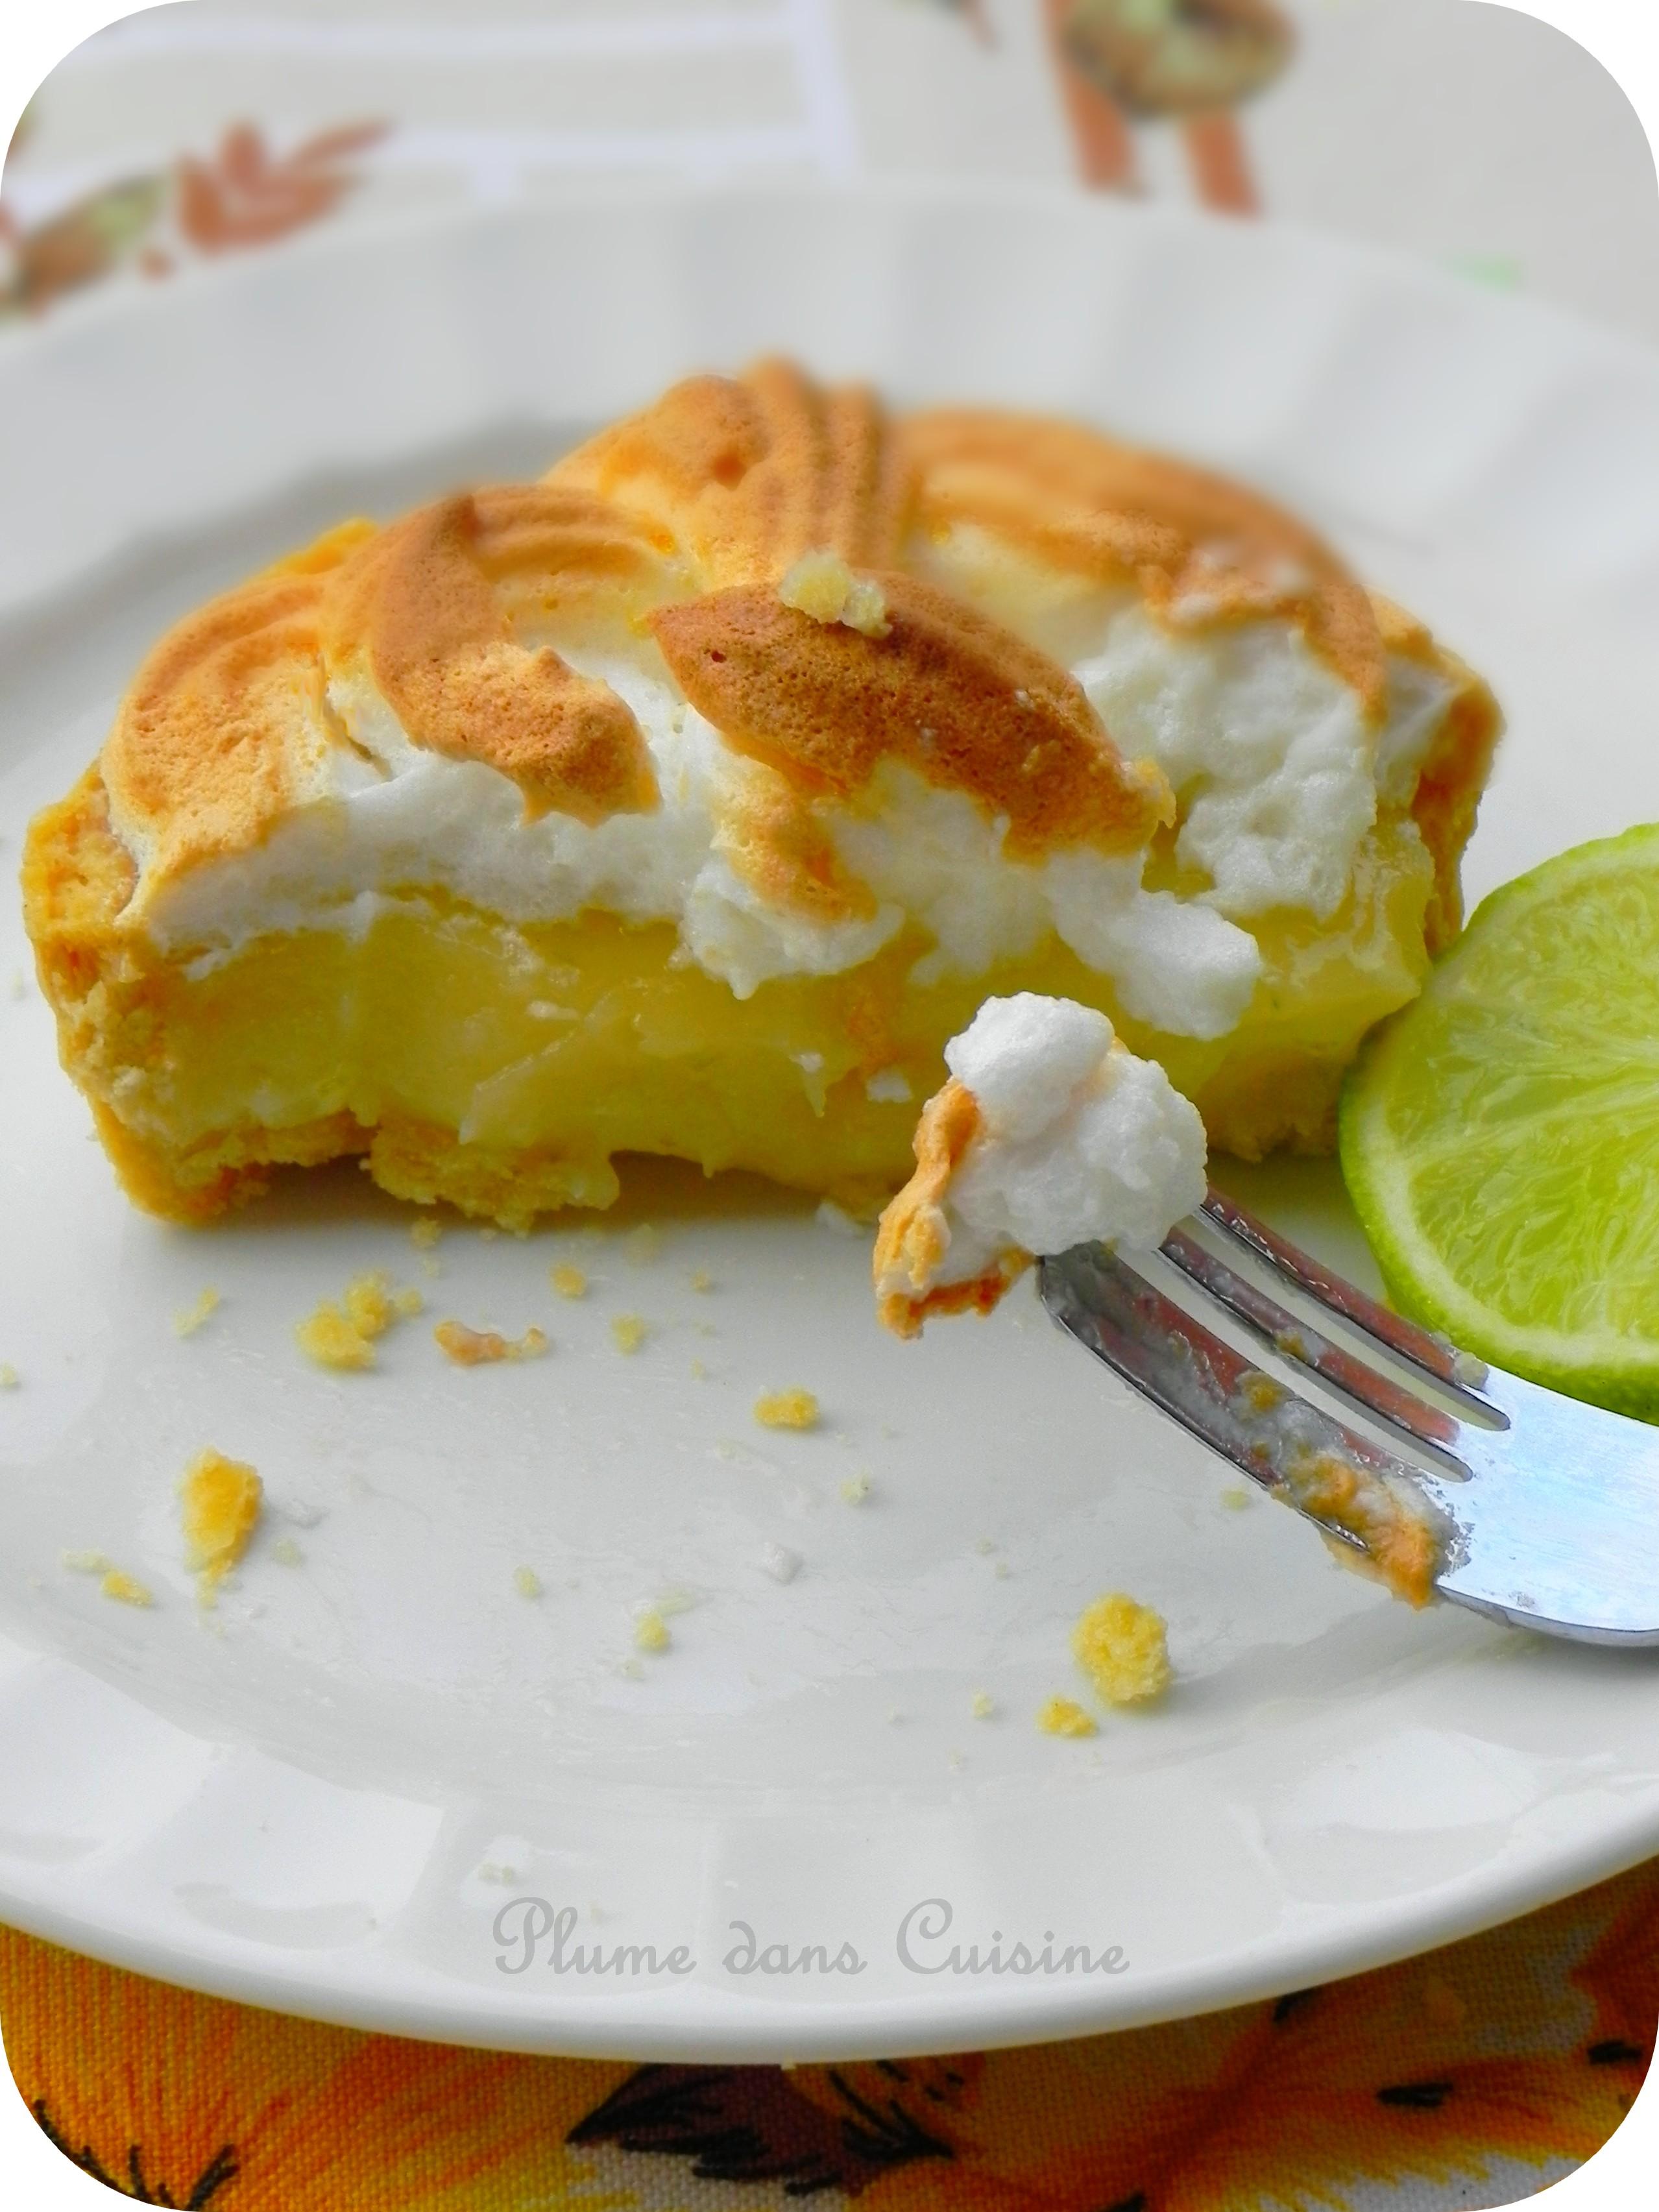 Tarte au citron meringu e une plume dans la cuisine - Tarte au citron meringuee herve cuisine ...